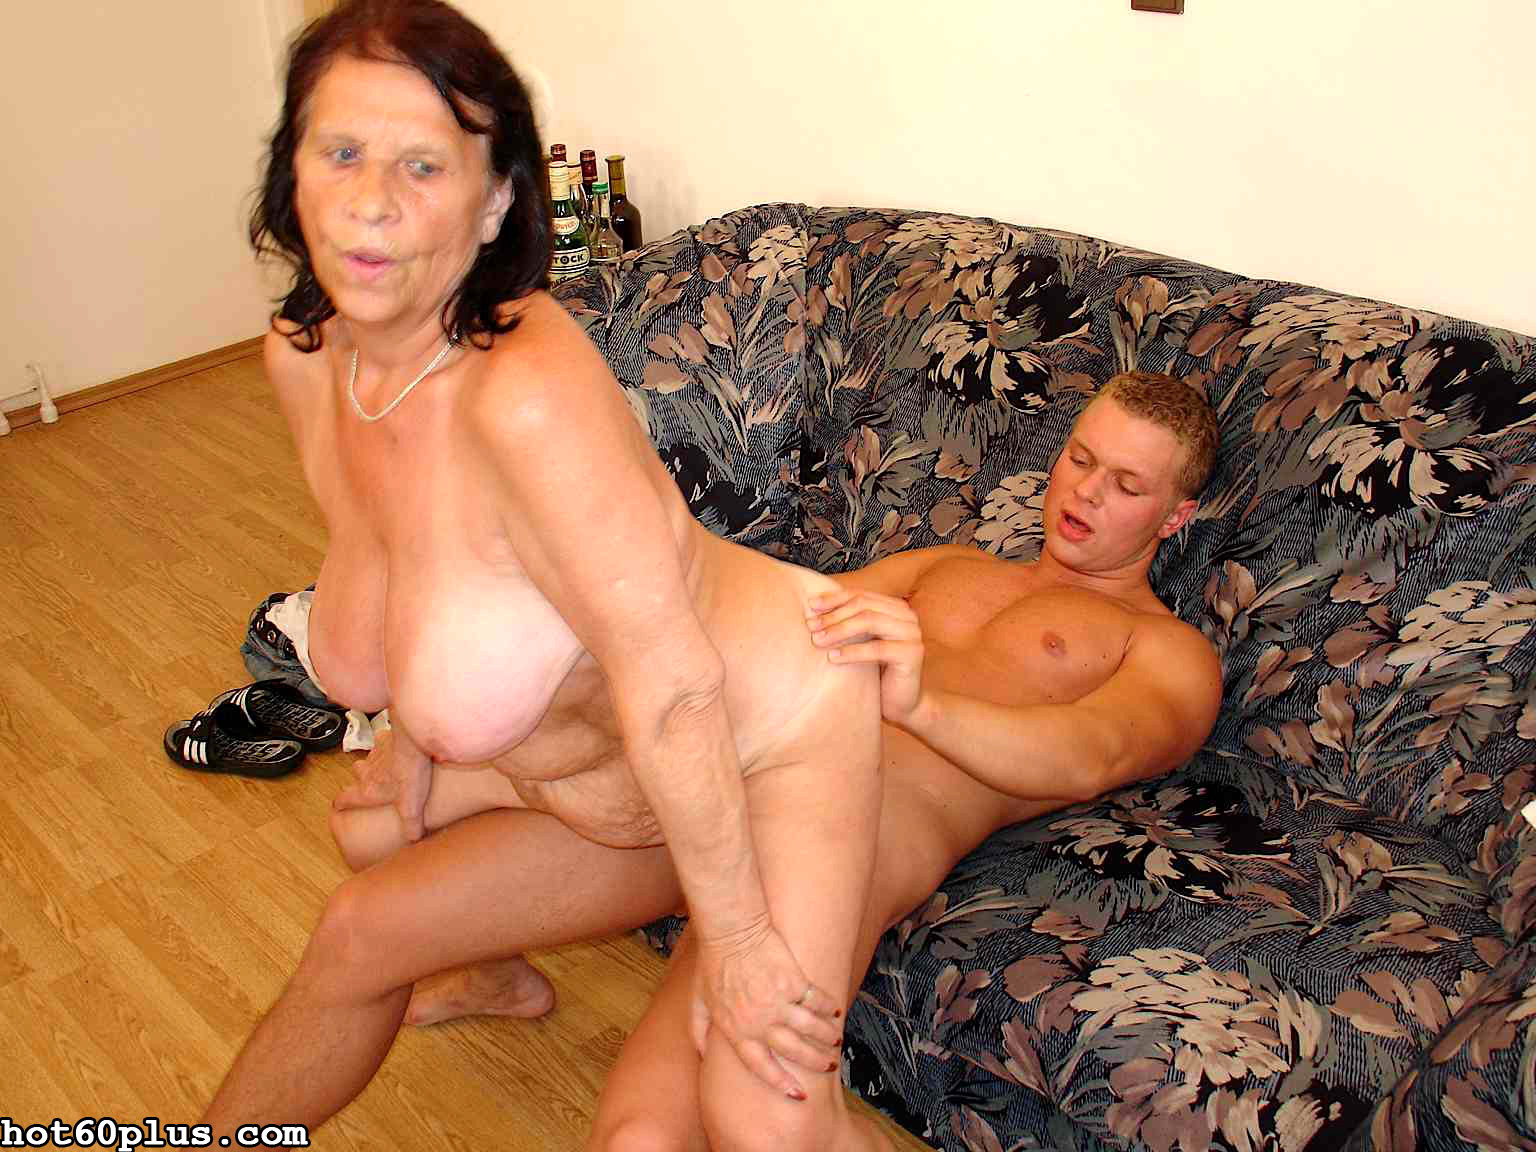 60 plus hot granny by troc 3